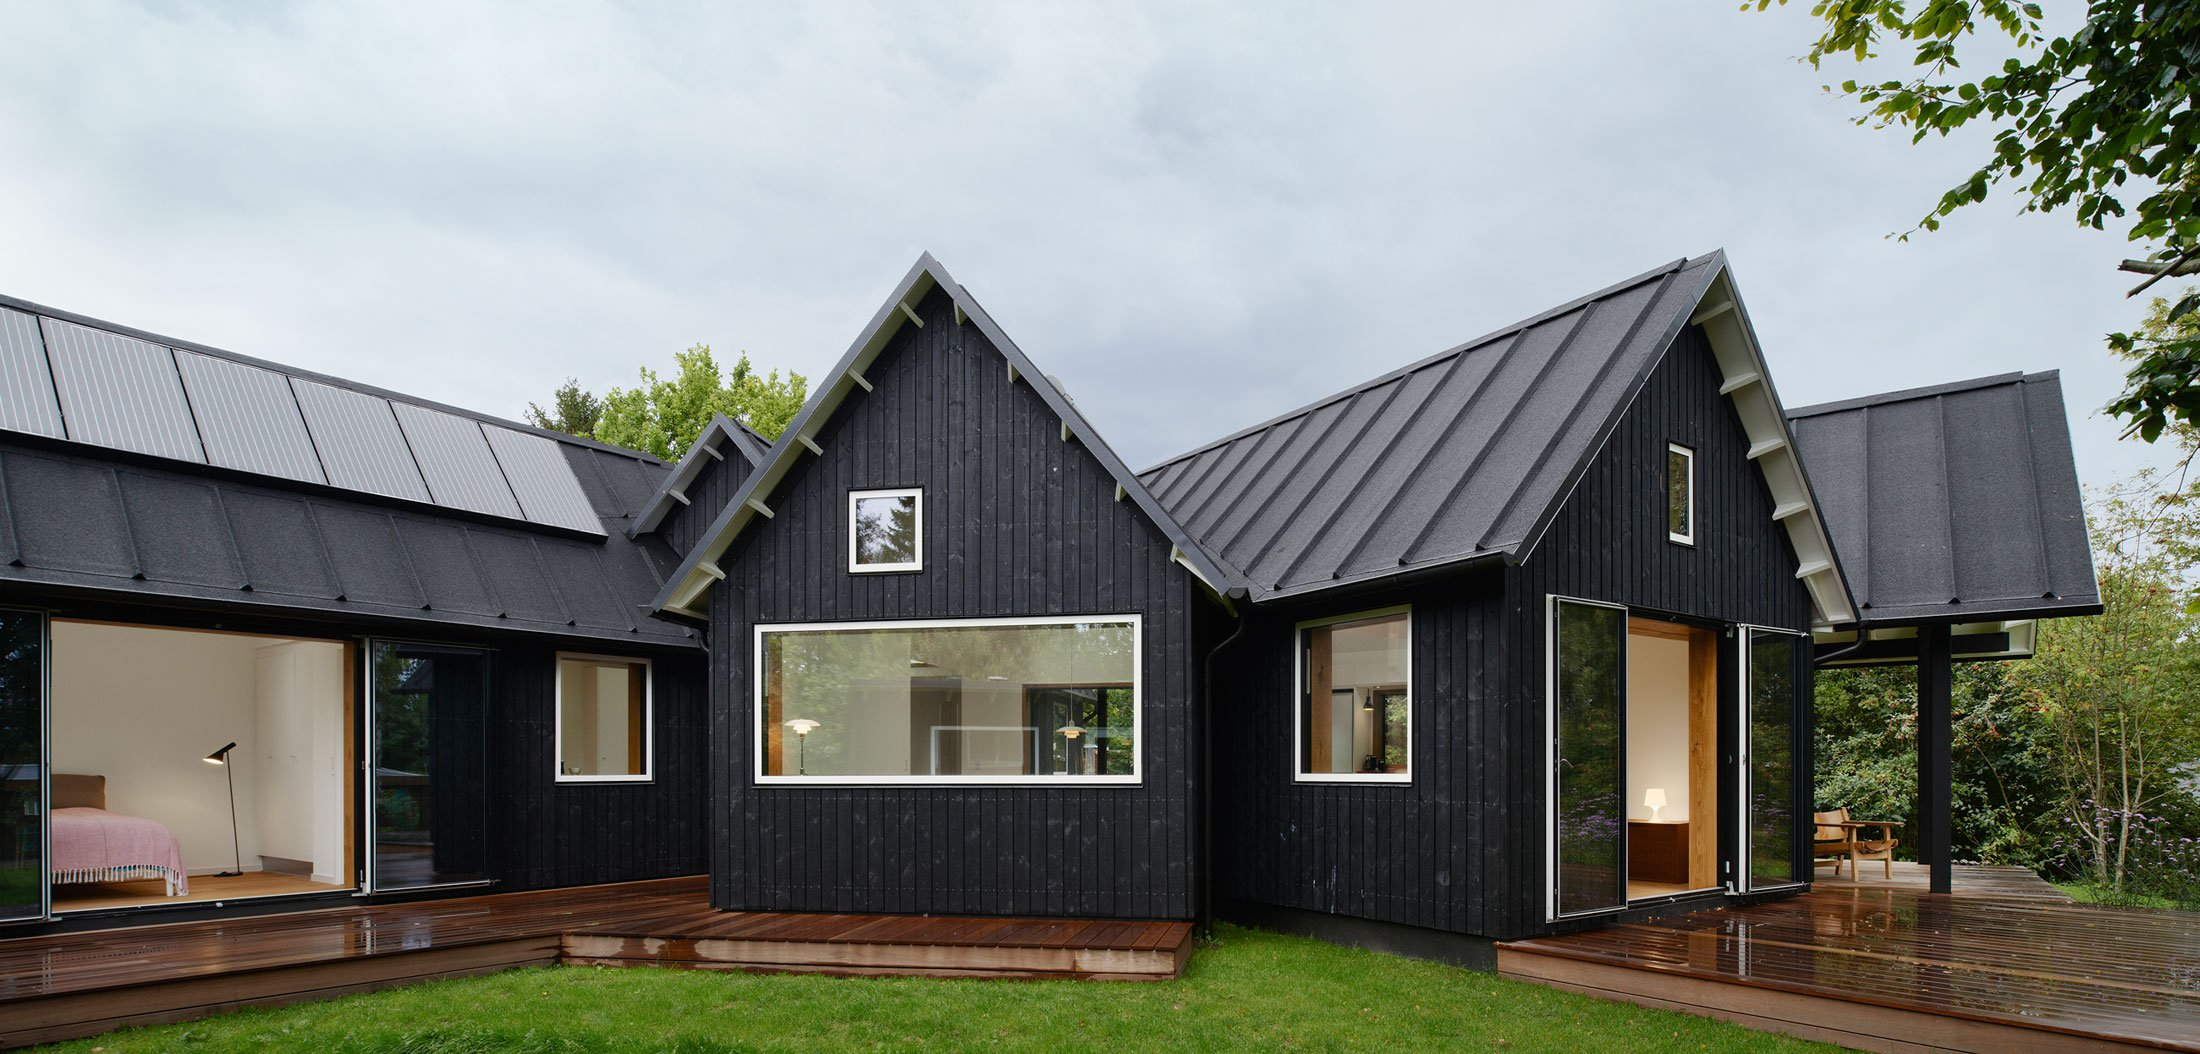 Village House By Powerhouse Company CAANdesign